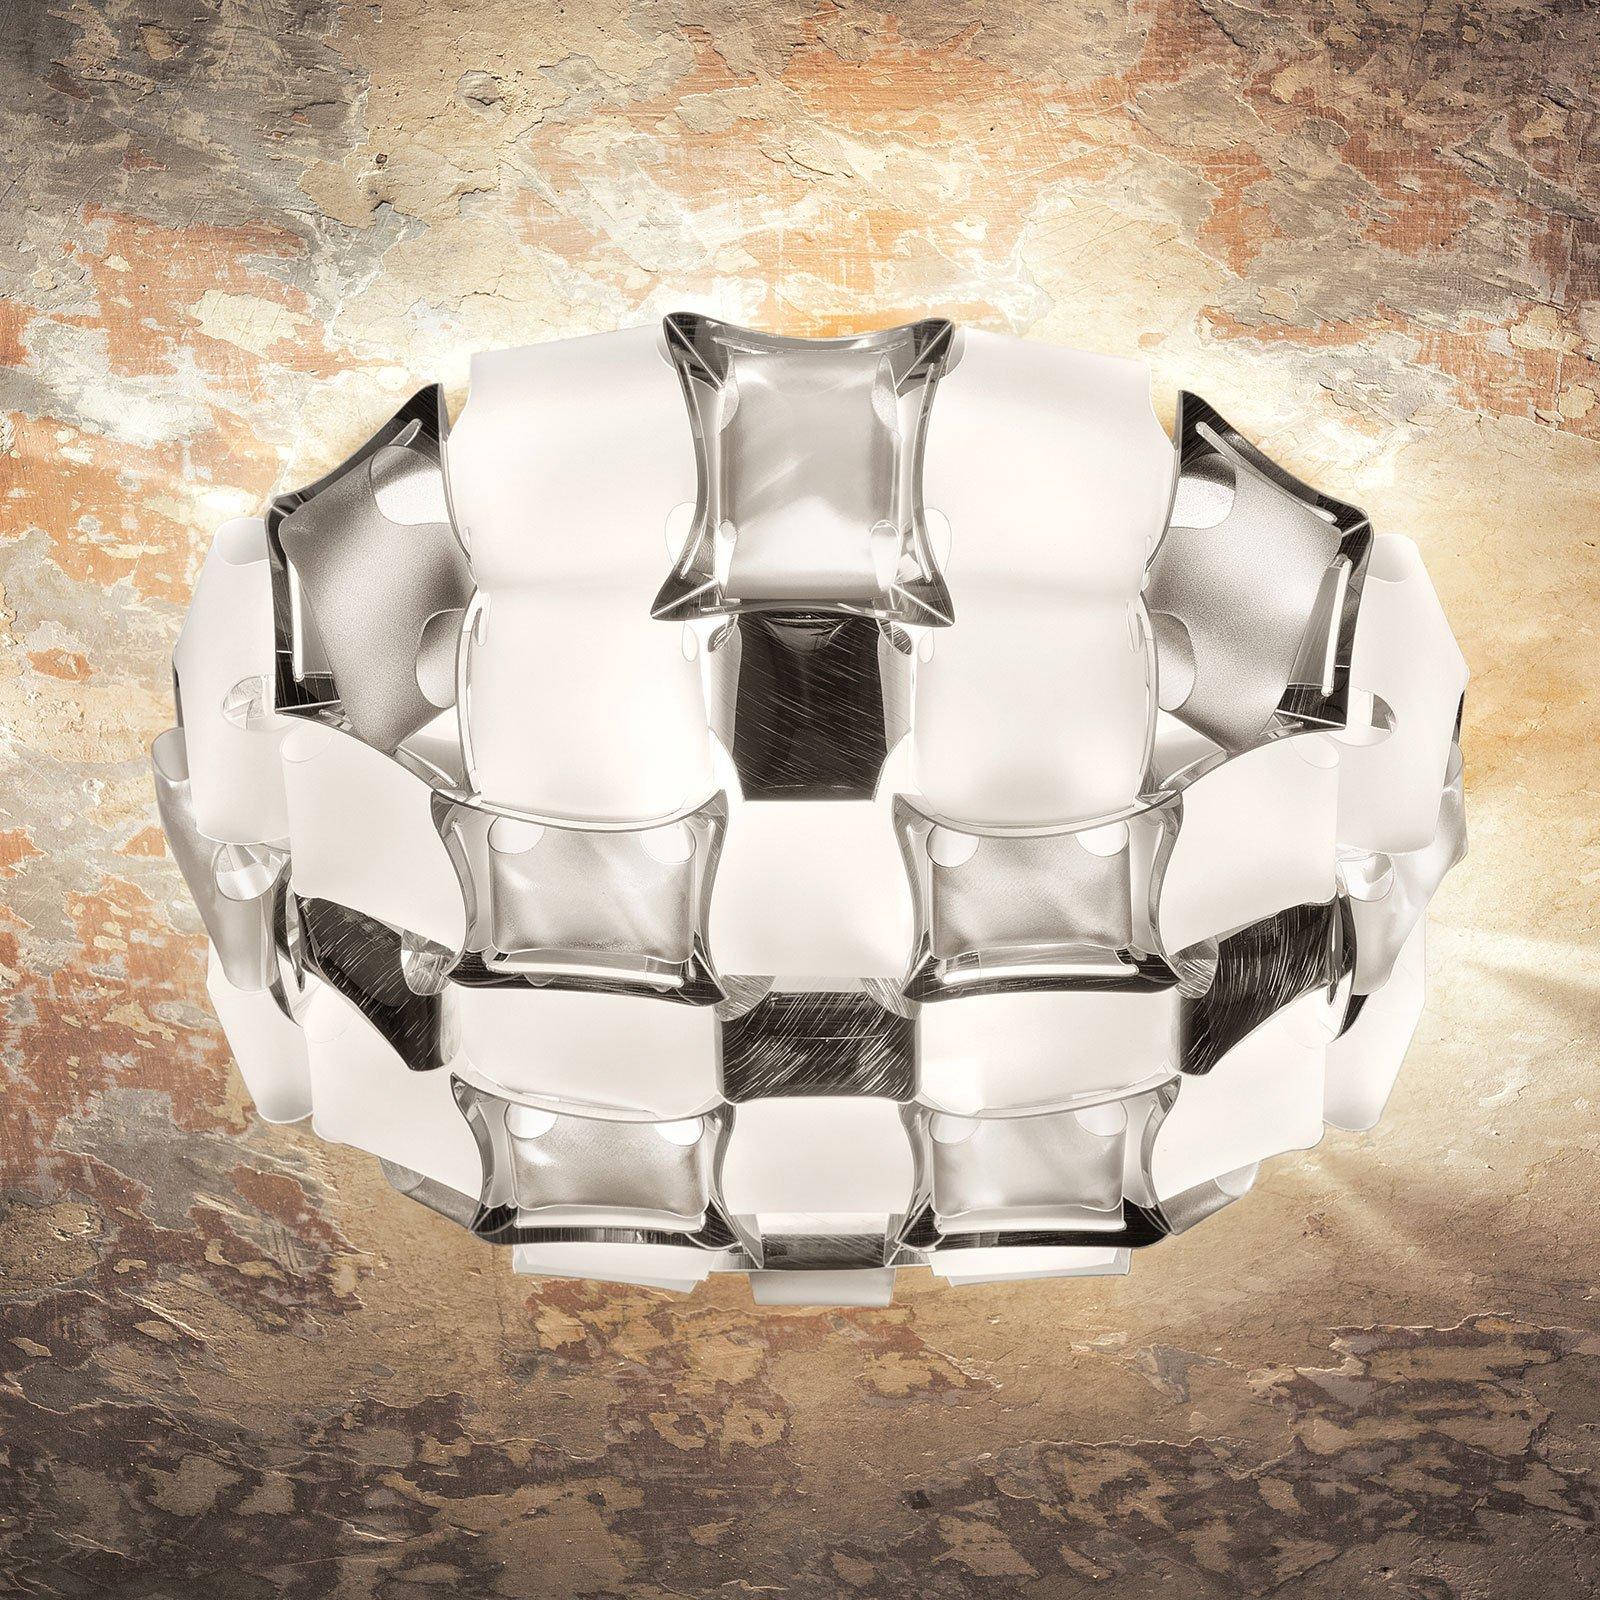 Slamp Mida taklampe, Ø 67 cm, platina/hvit